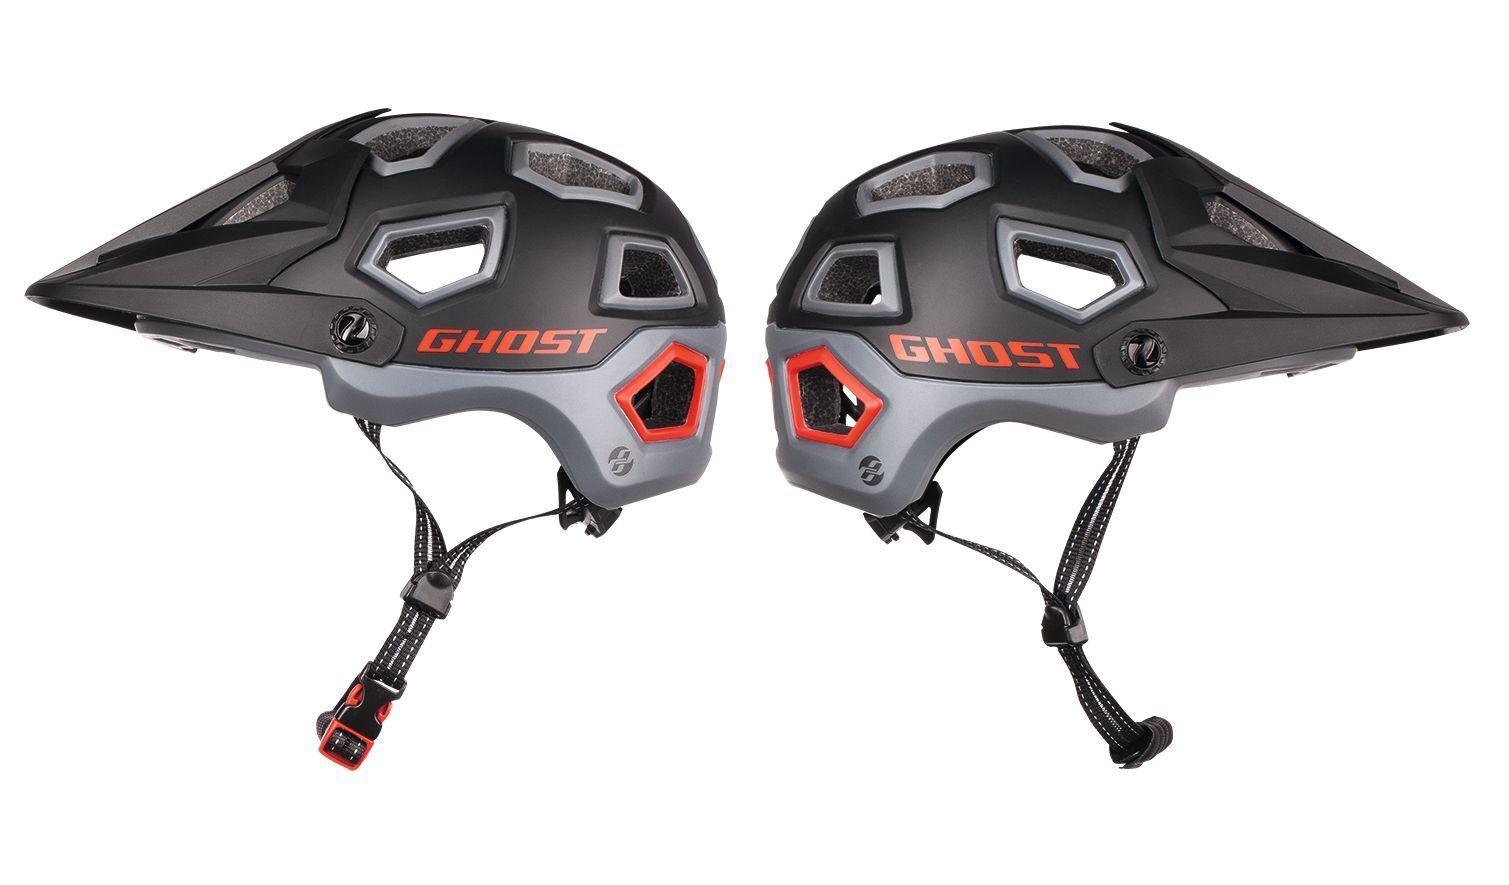 GHOST All Mountain Helmet - in schwarz grau rot - Größe 57-61 cm - Fahrradhelm